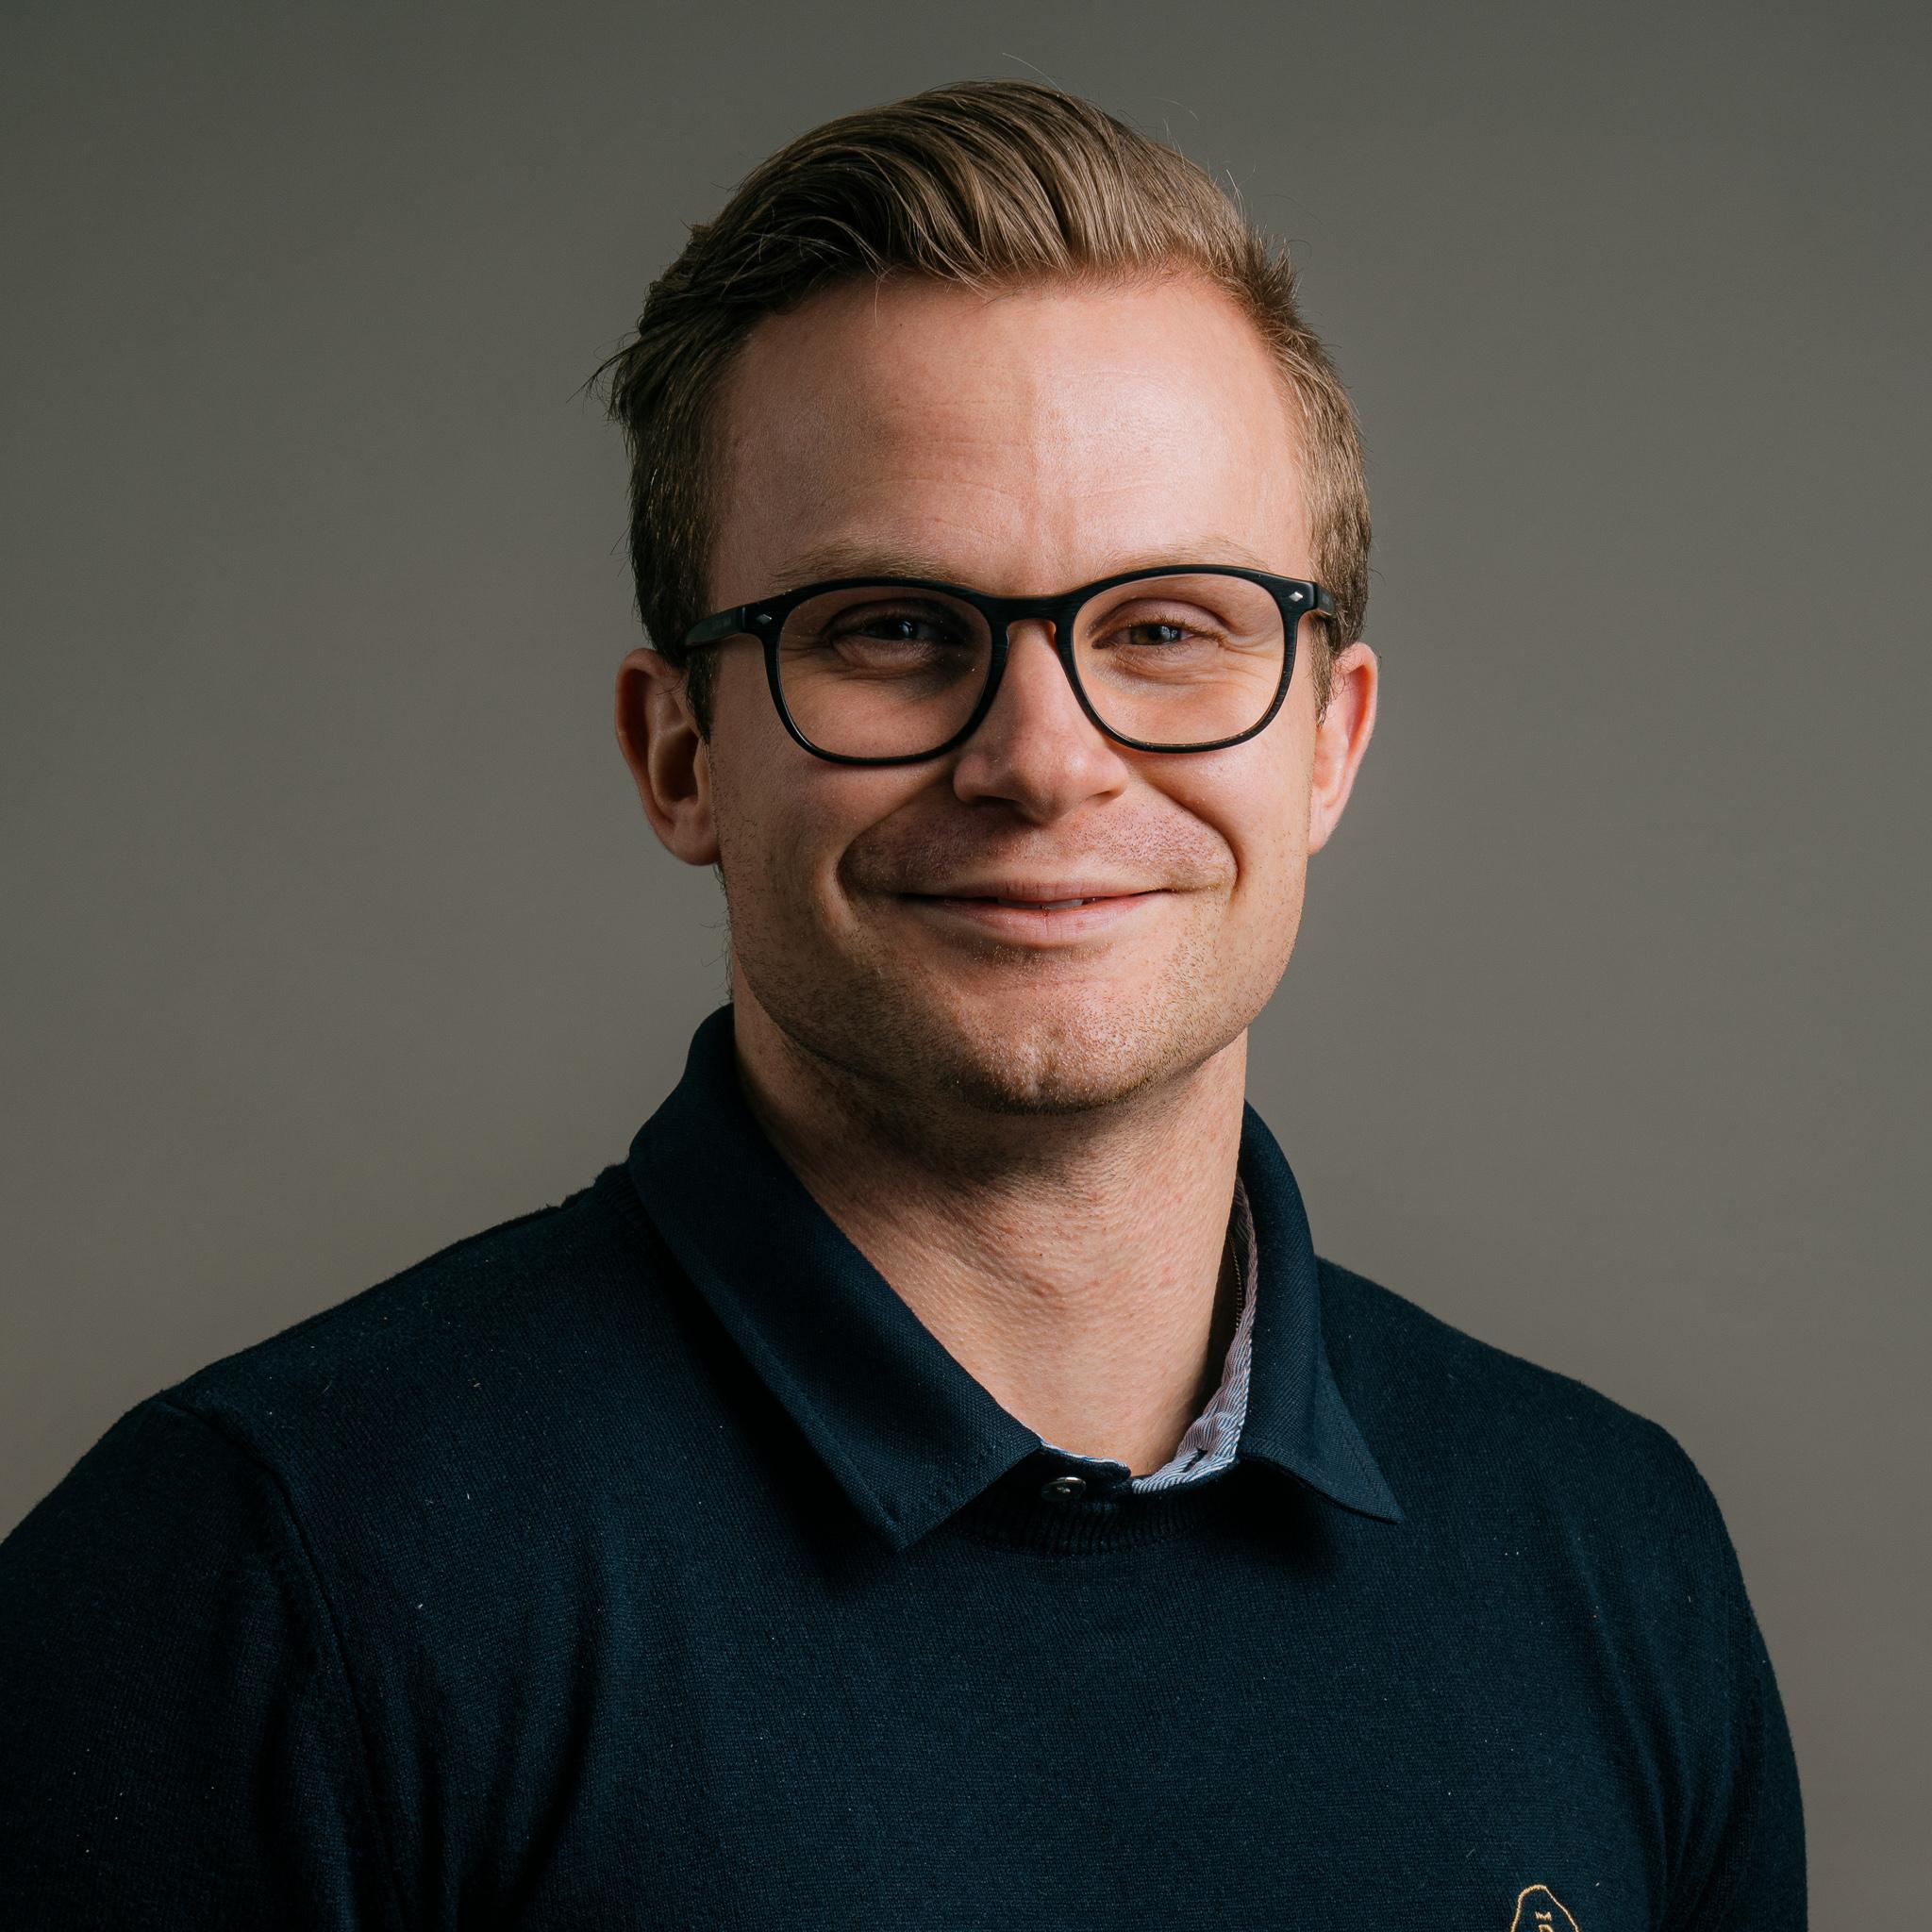 Simon Skoglund